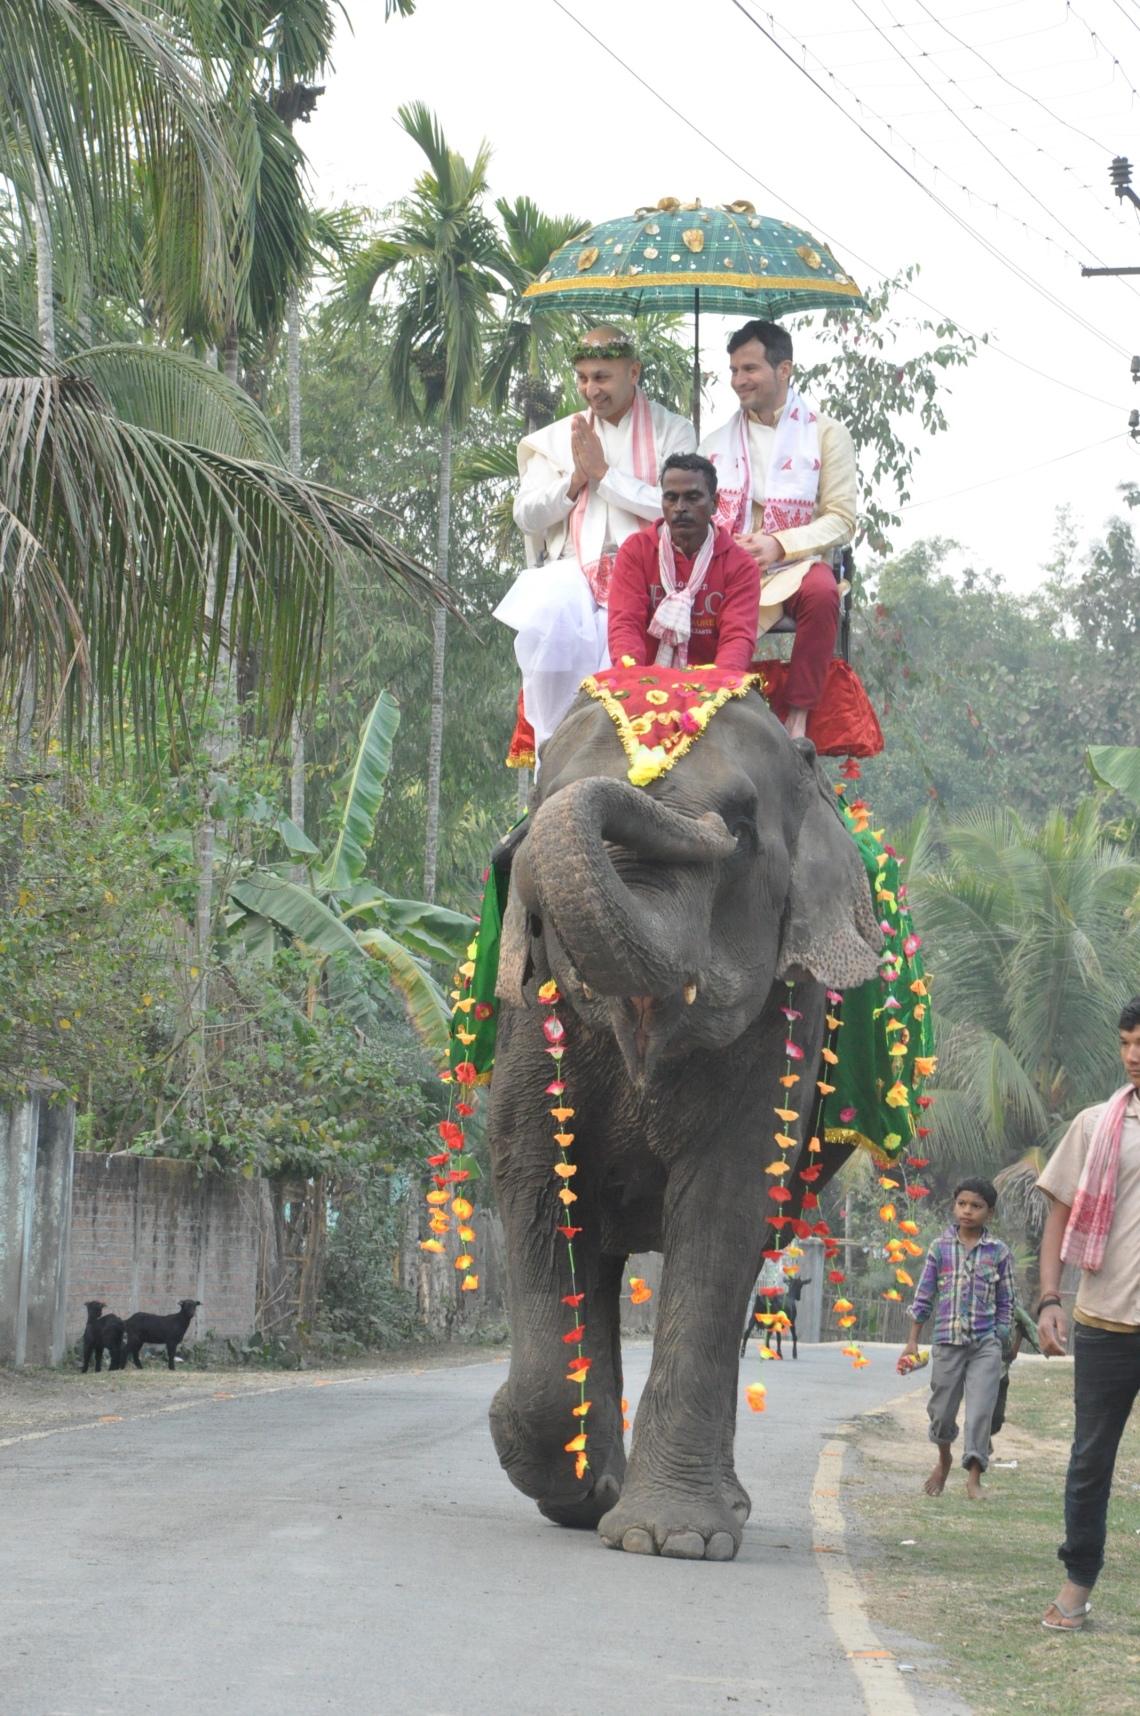 Wedding elephant in Assam, India